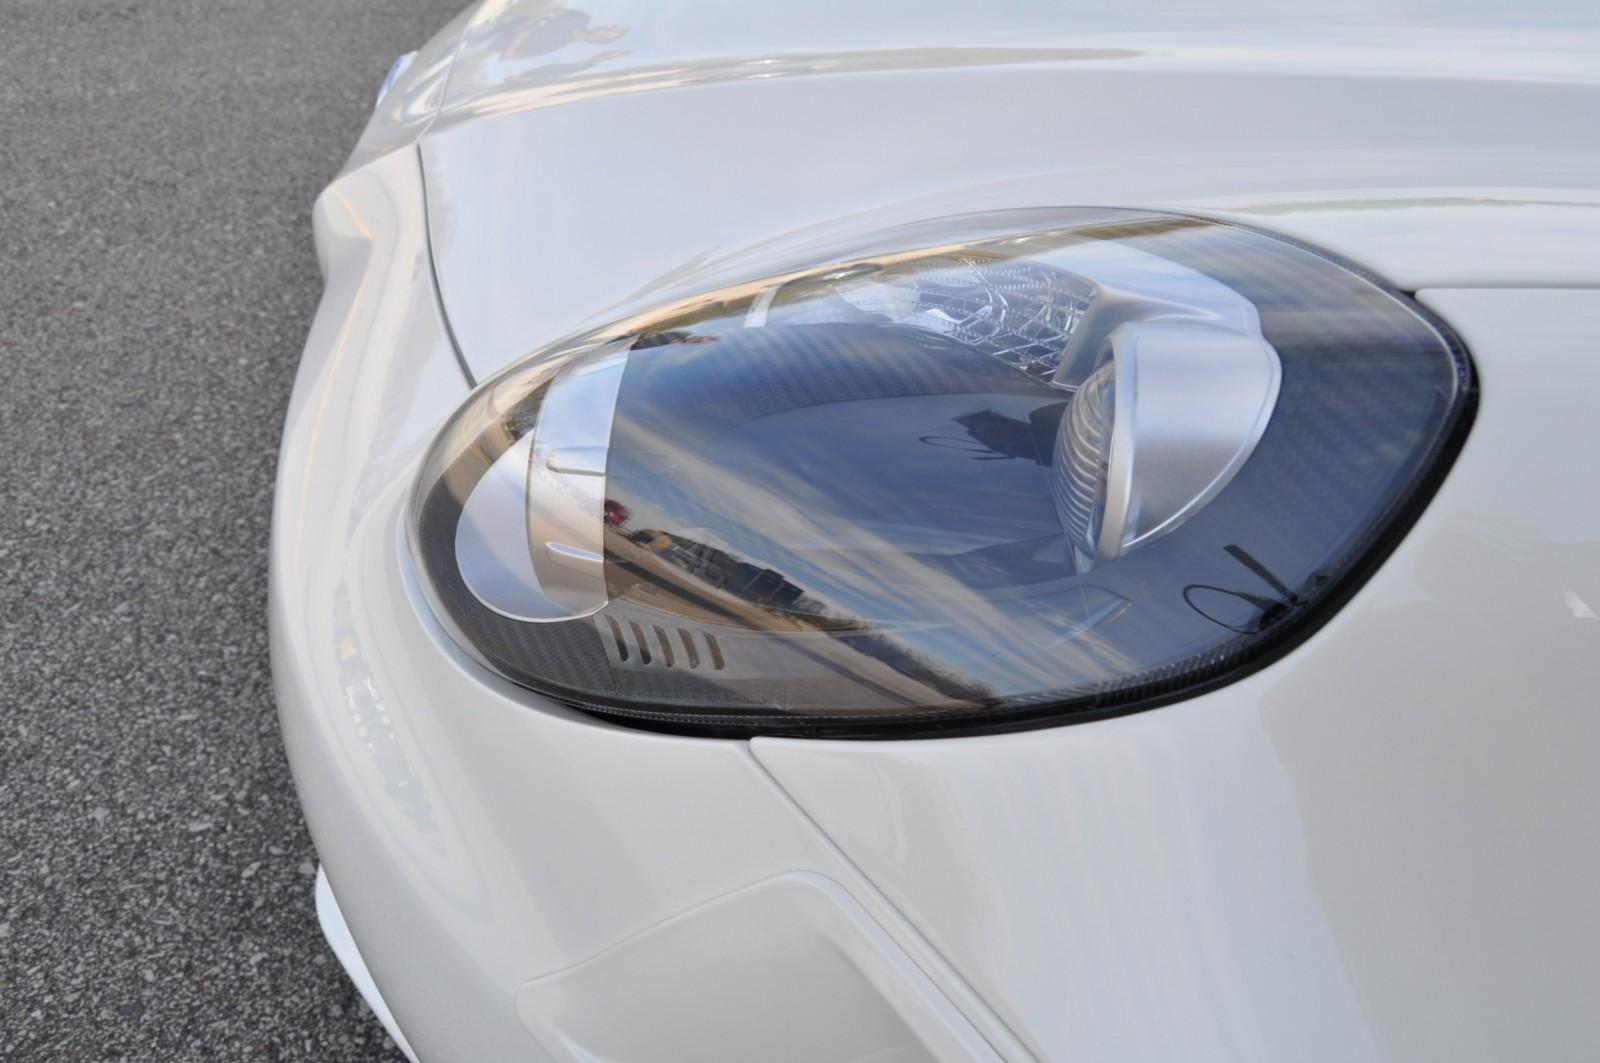 Gorgeous 2015 Alfa Romeo 4c Revealed In Full Usa Trim New Headlights 46